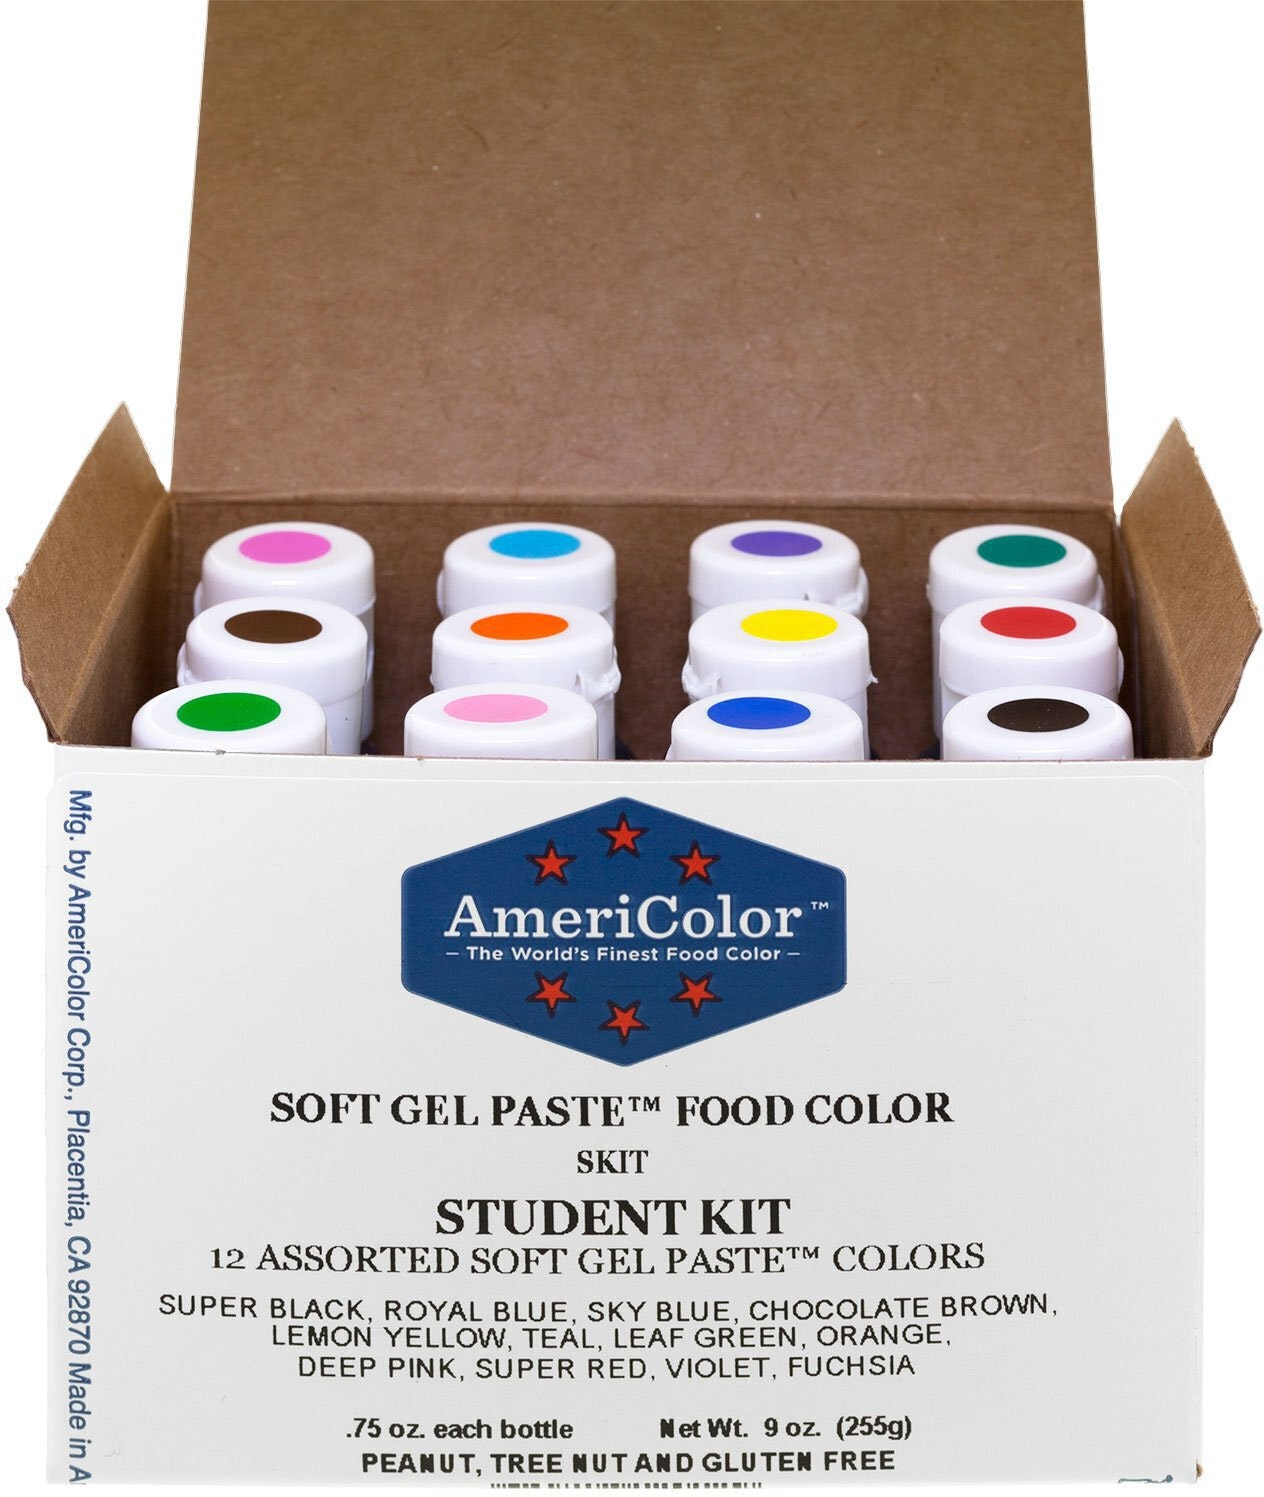 AmeriColor Student Soft Gel Paste Food Color